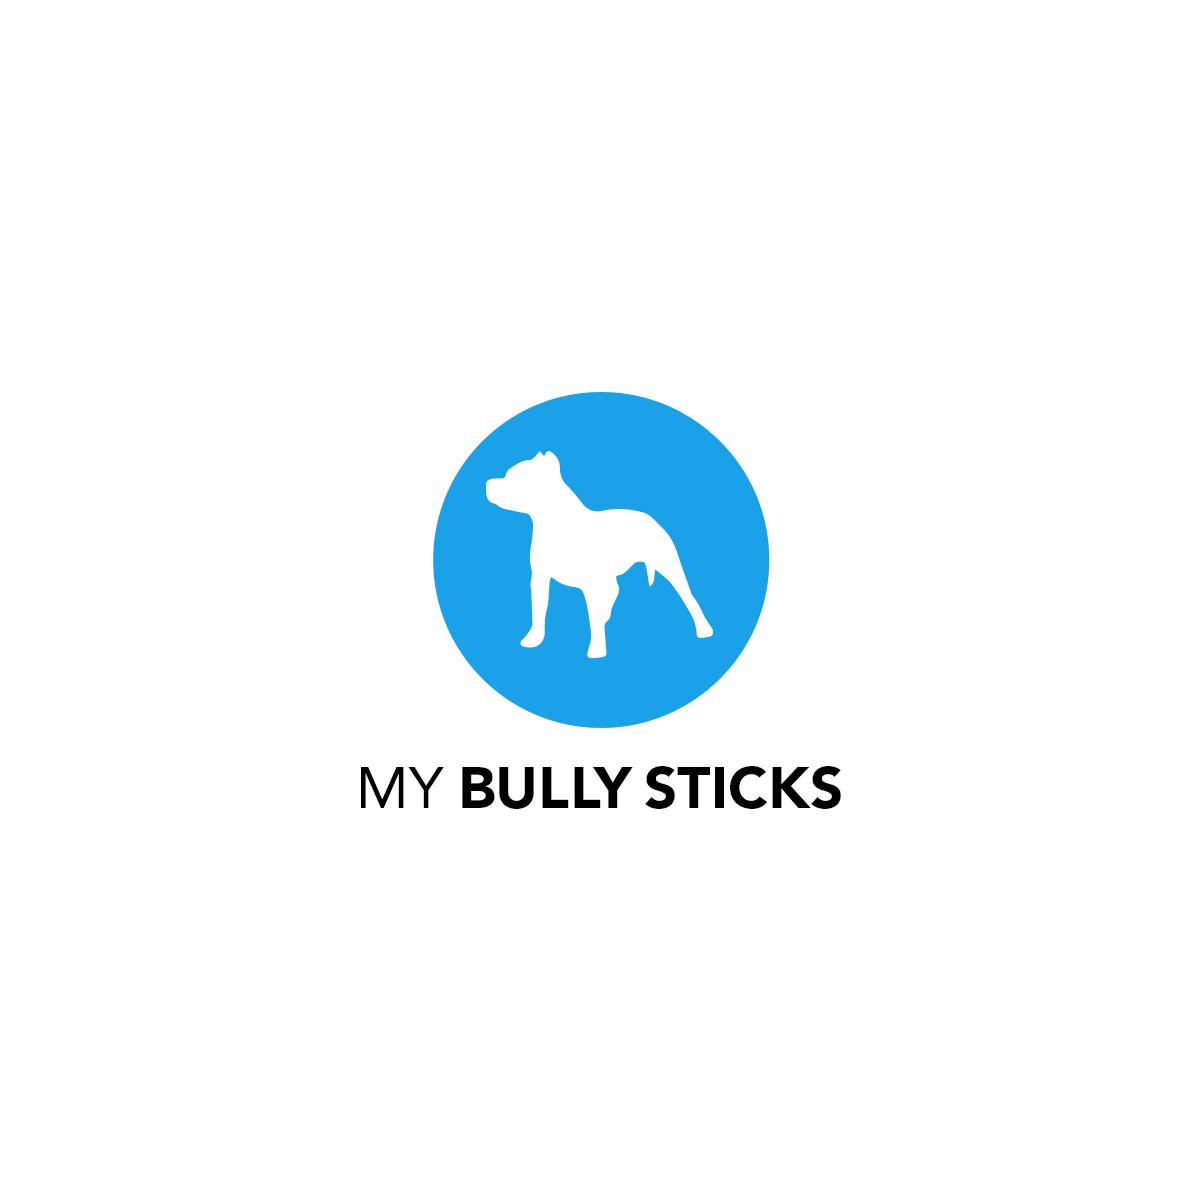 My Bully Sticks